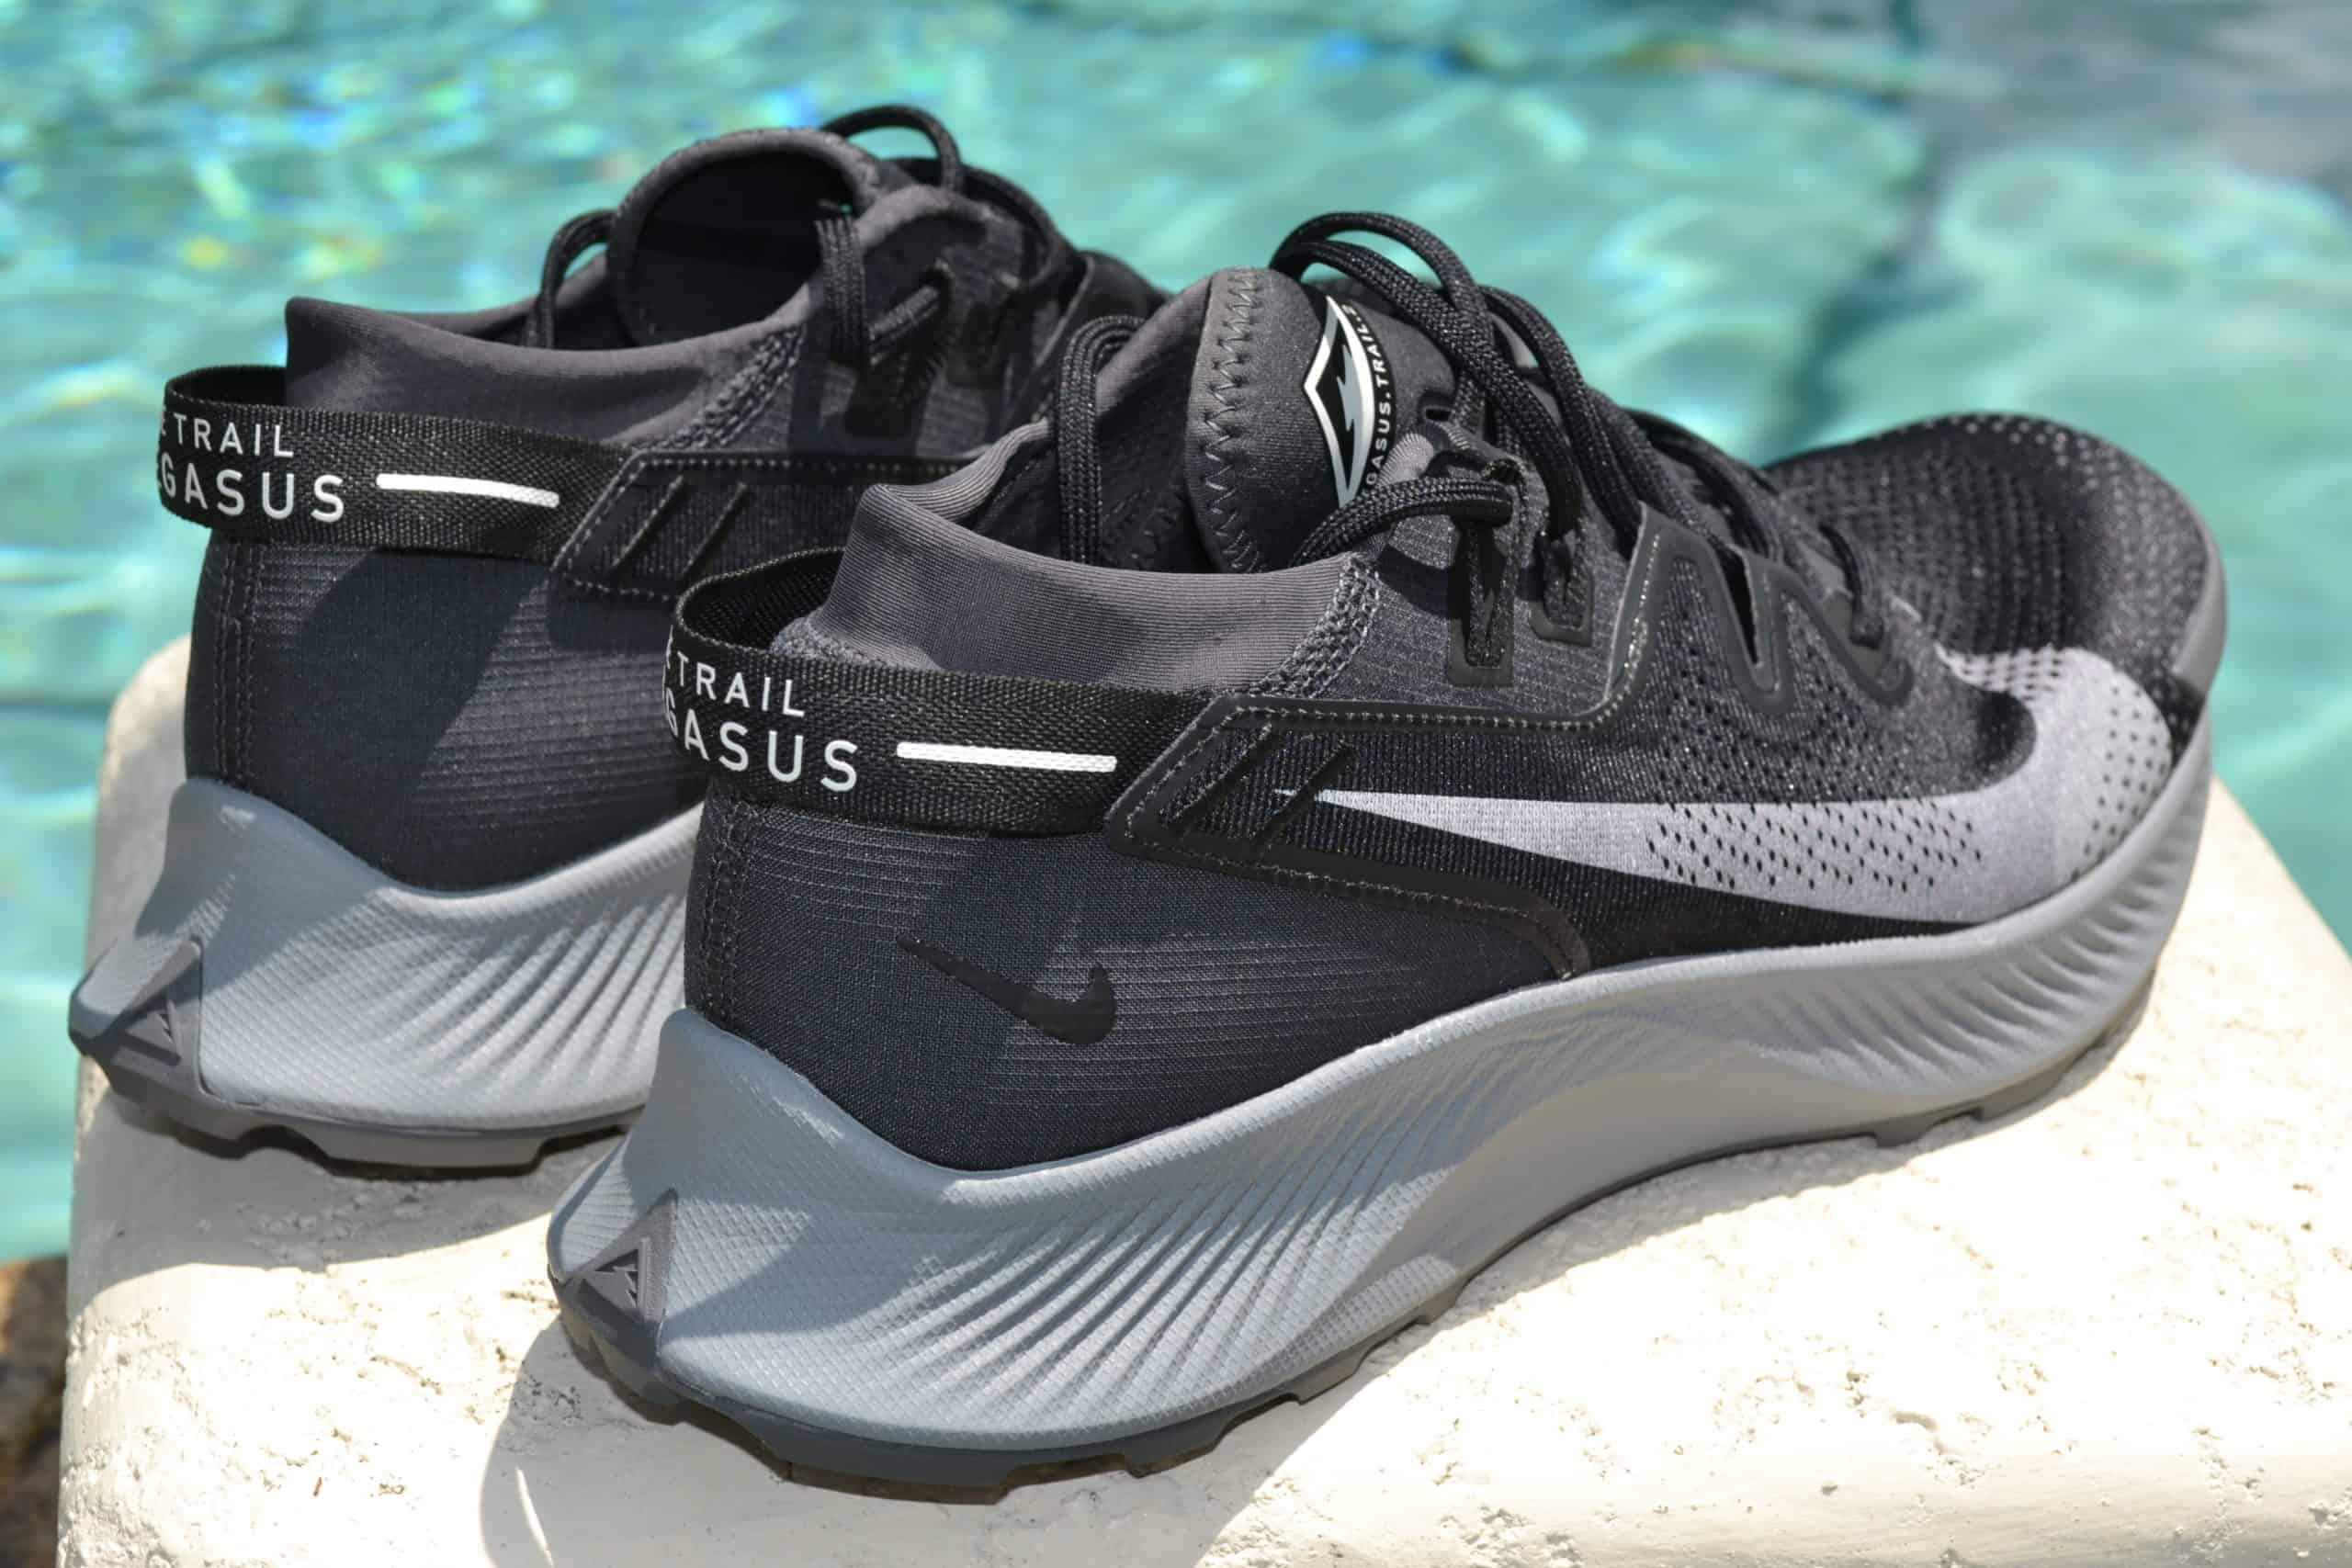 Nike Pegasus Trail 2 Running Shoe Review - Cross Train Clothes